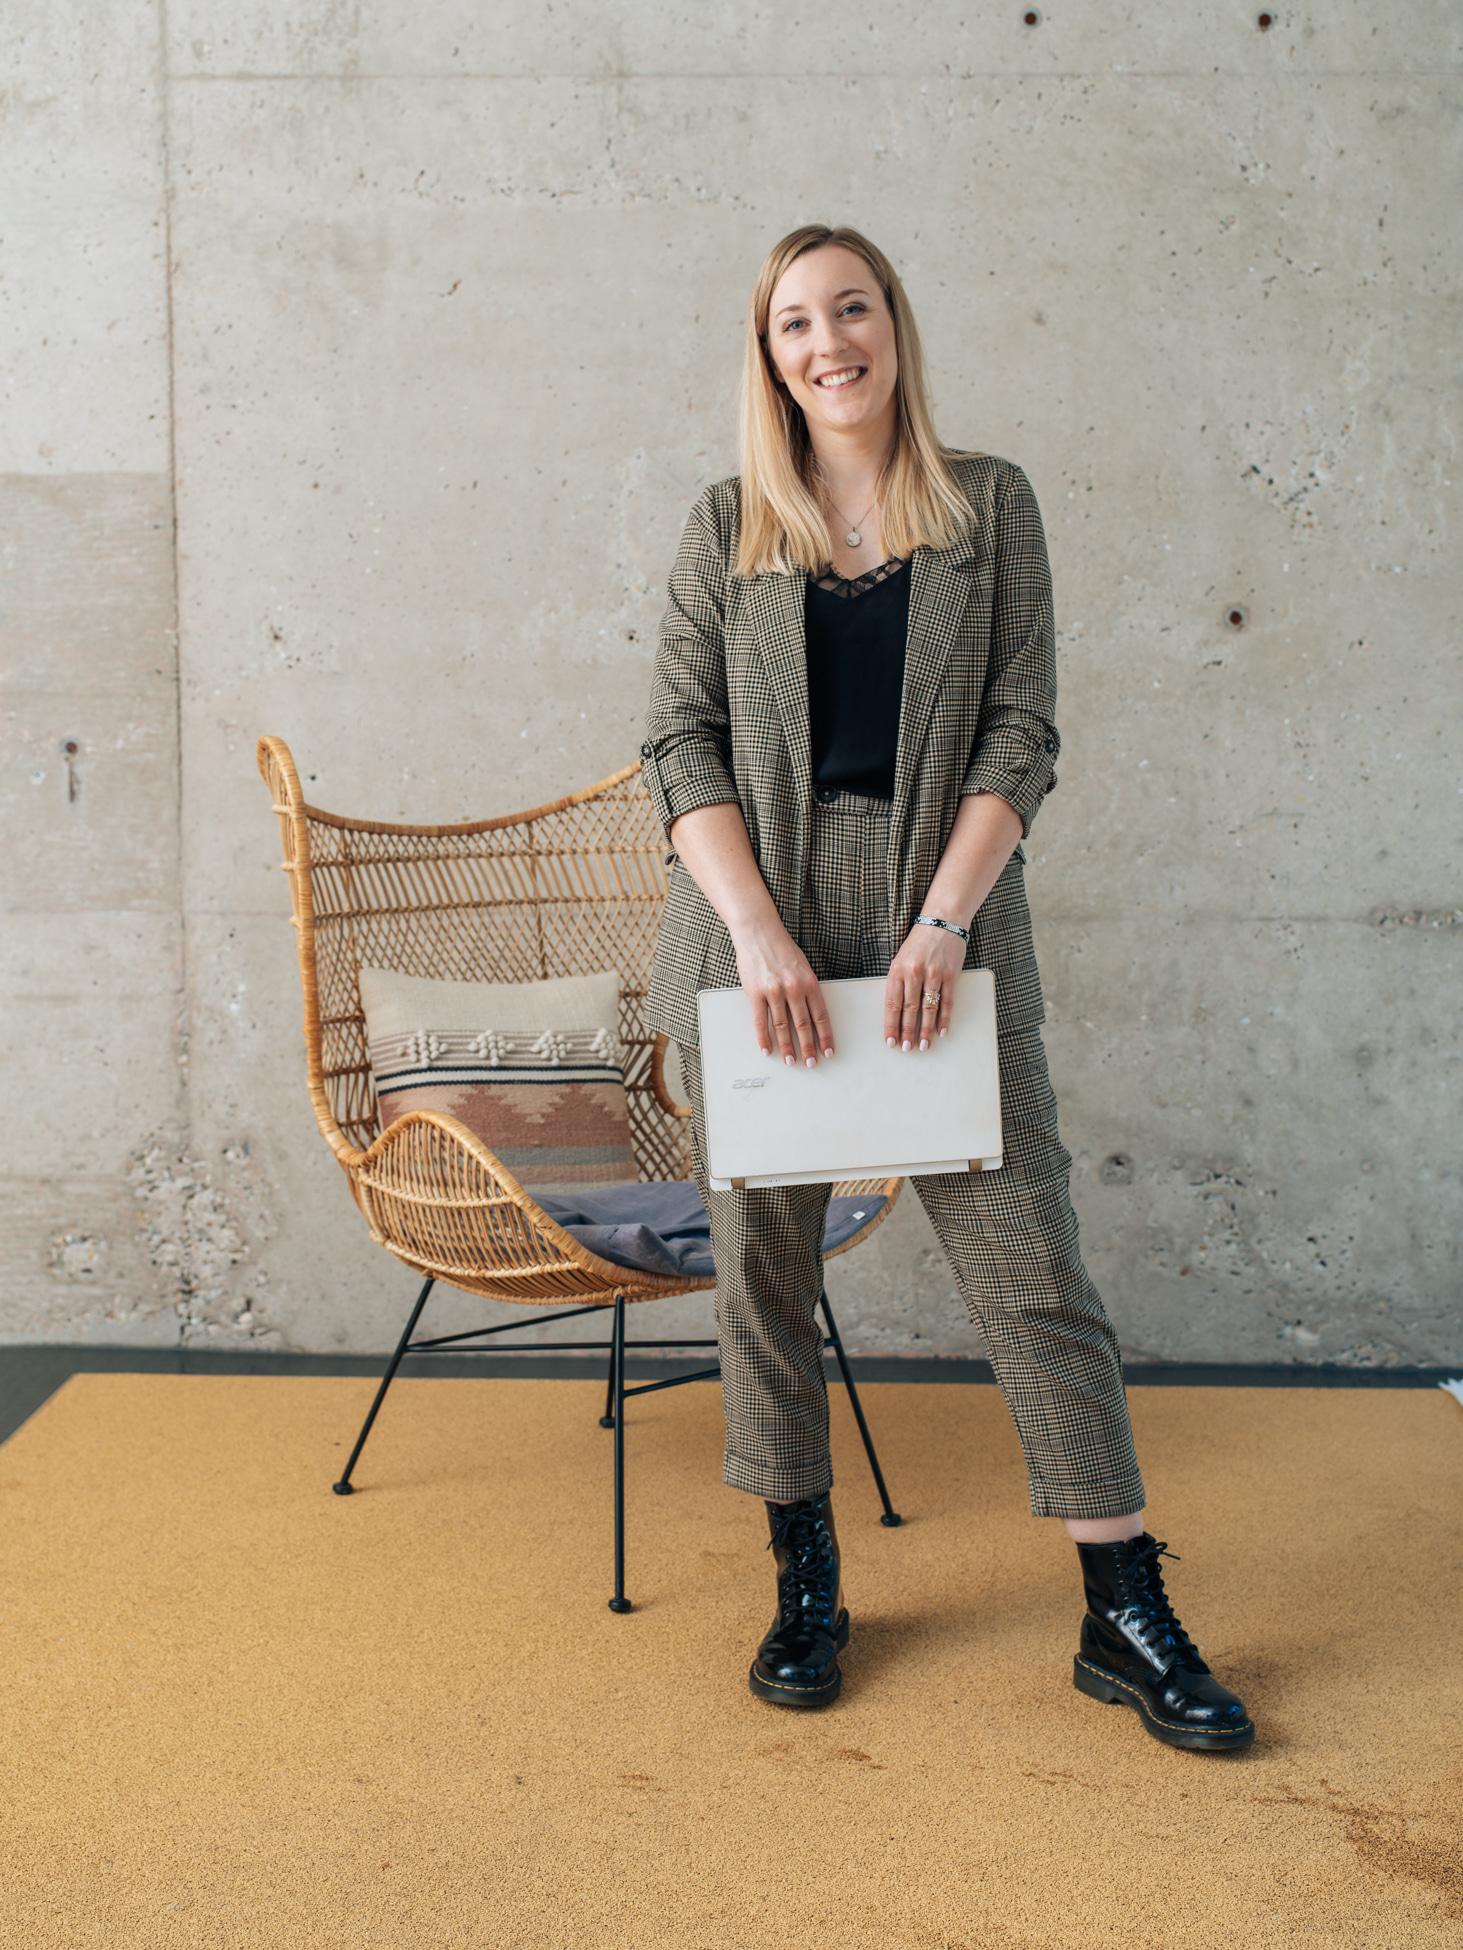 FEMBoss-Gründerin-Anja-Krystina-Hermes-Businessportrait-Sven-Cichowicz